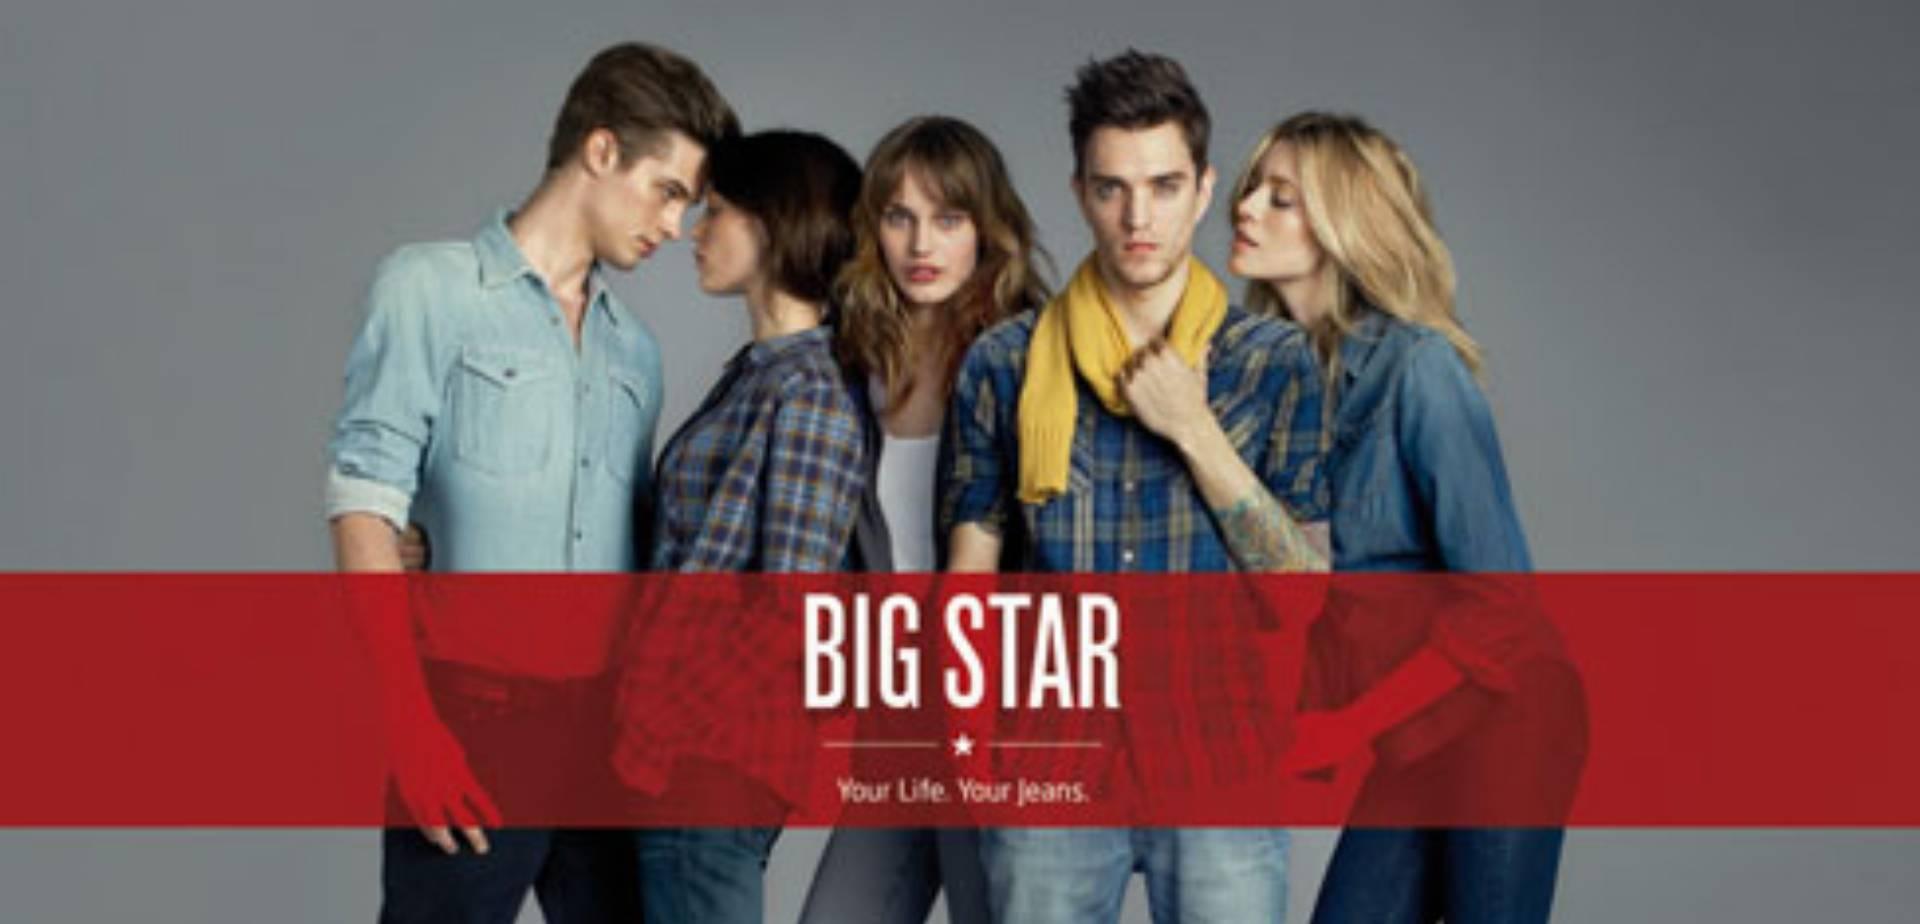 Big Star jesień-zima 2012/2013